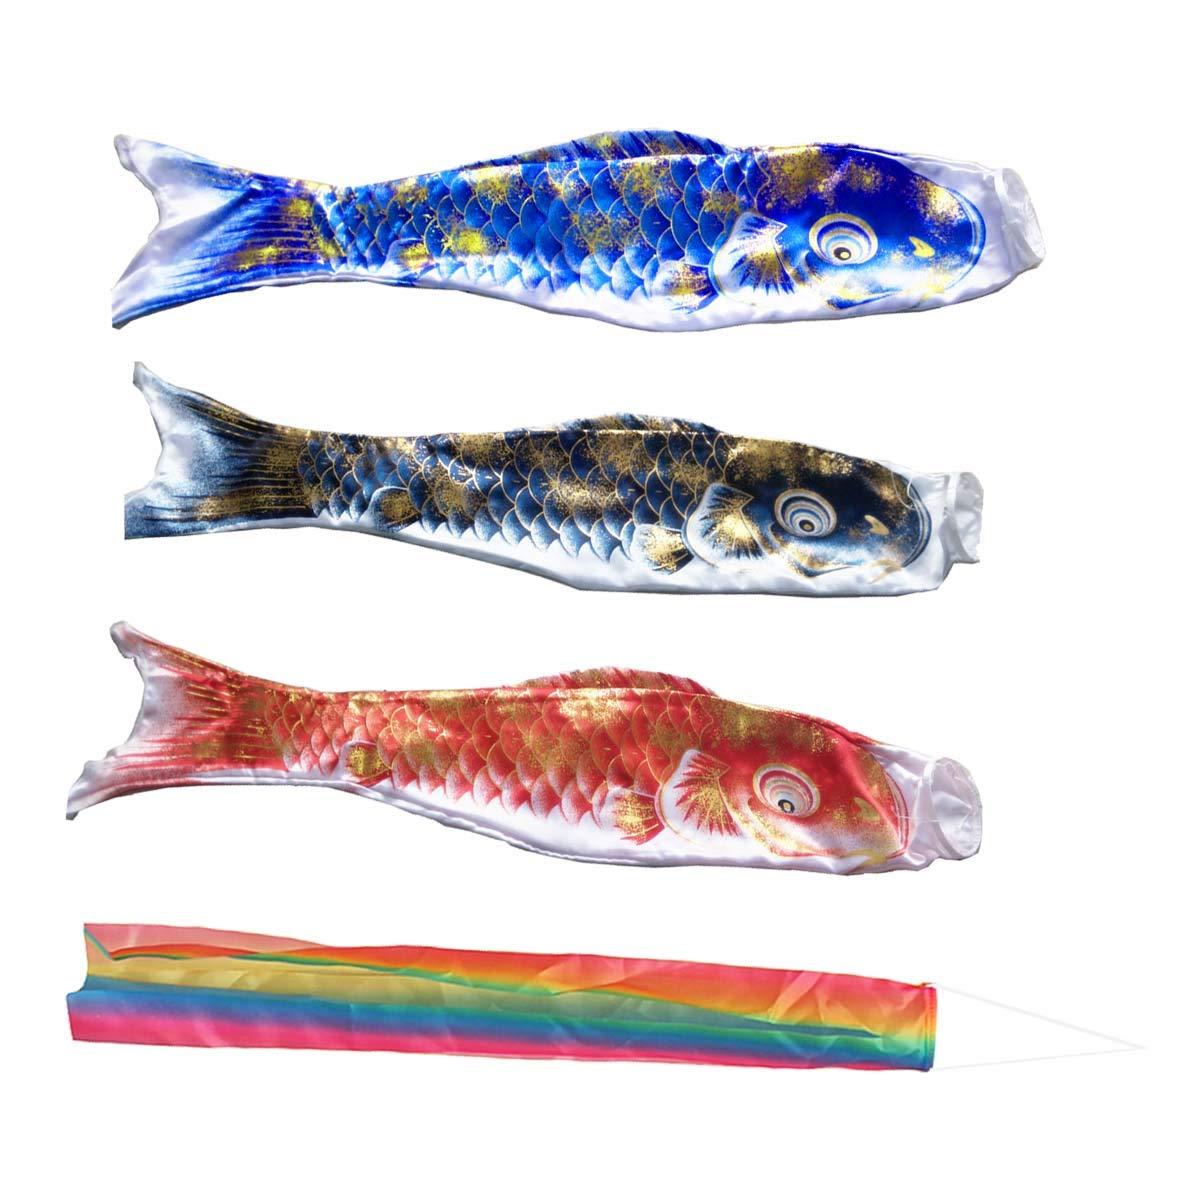 Japanese Koinobori Carp Windsocks Streamers Colorful Tassels Flag Decoration